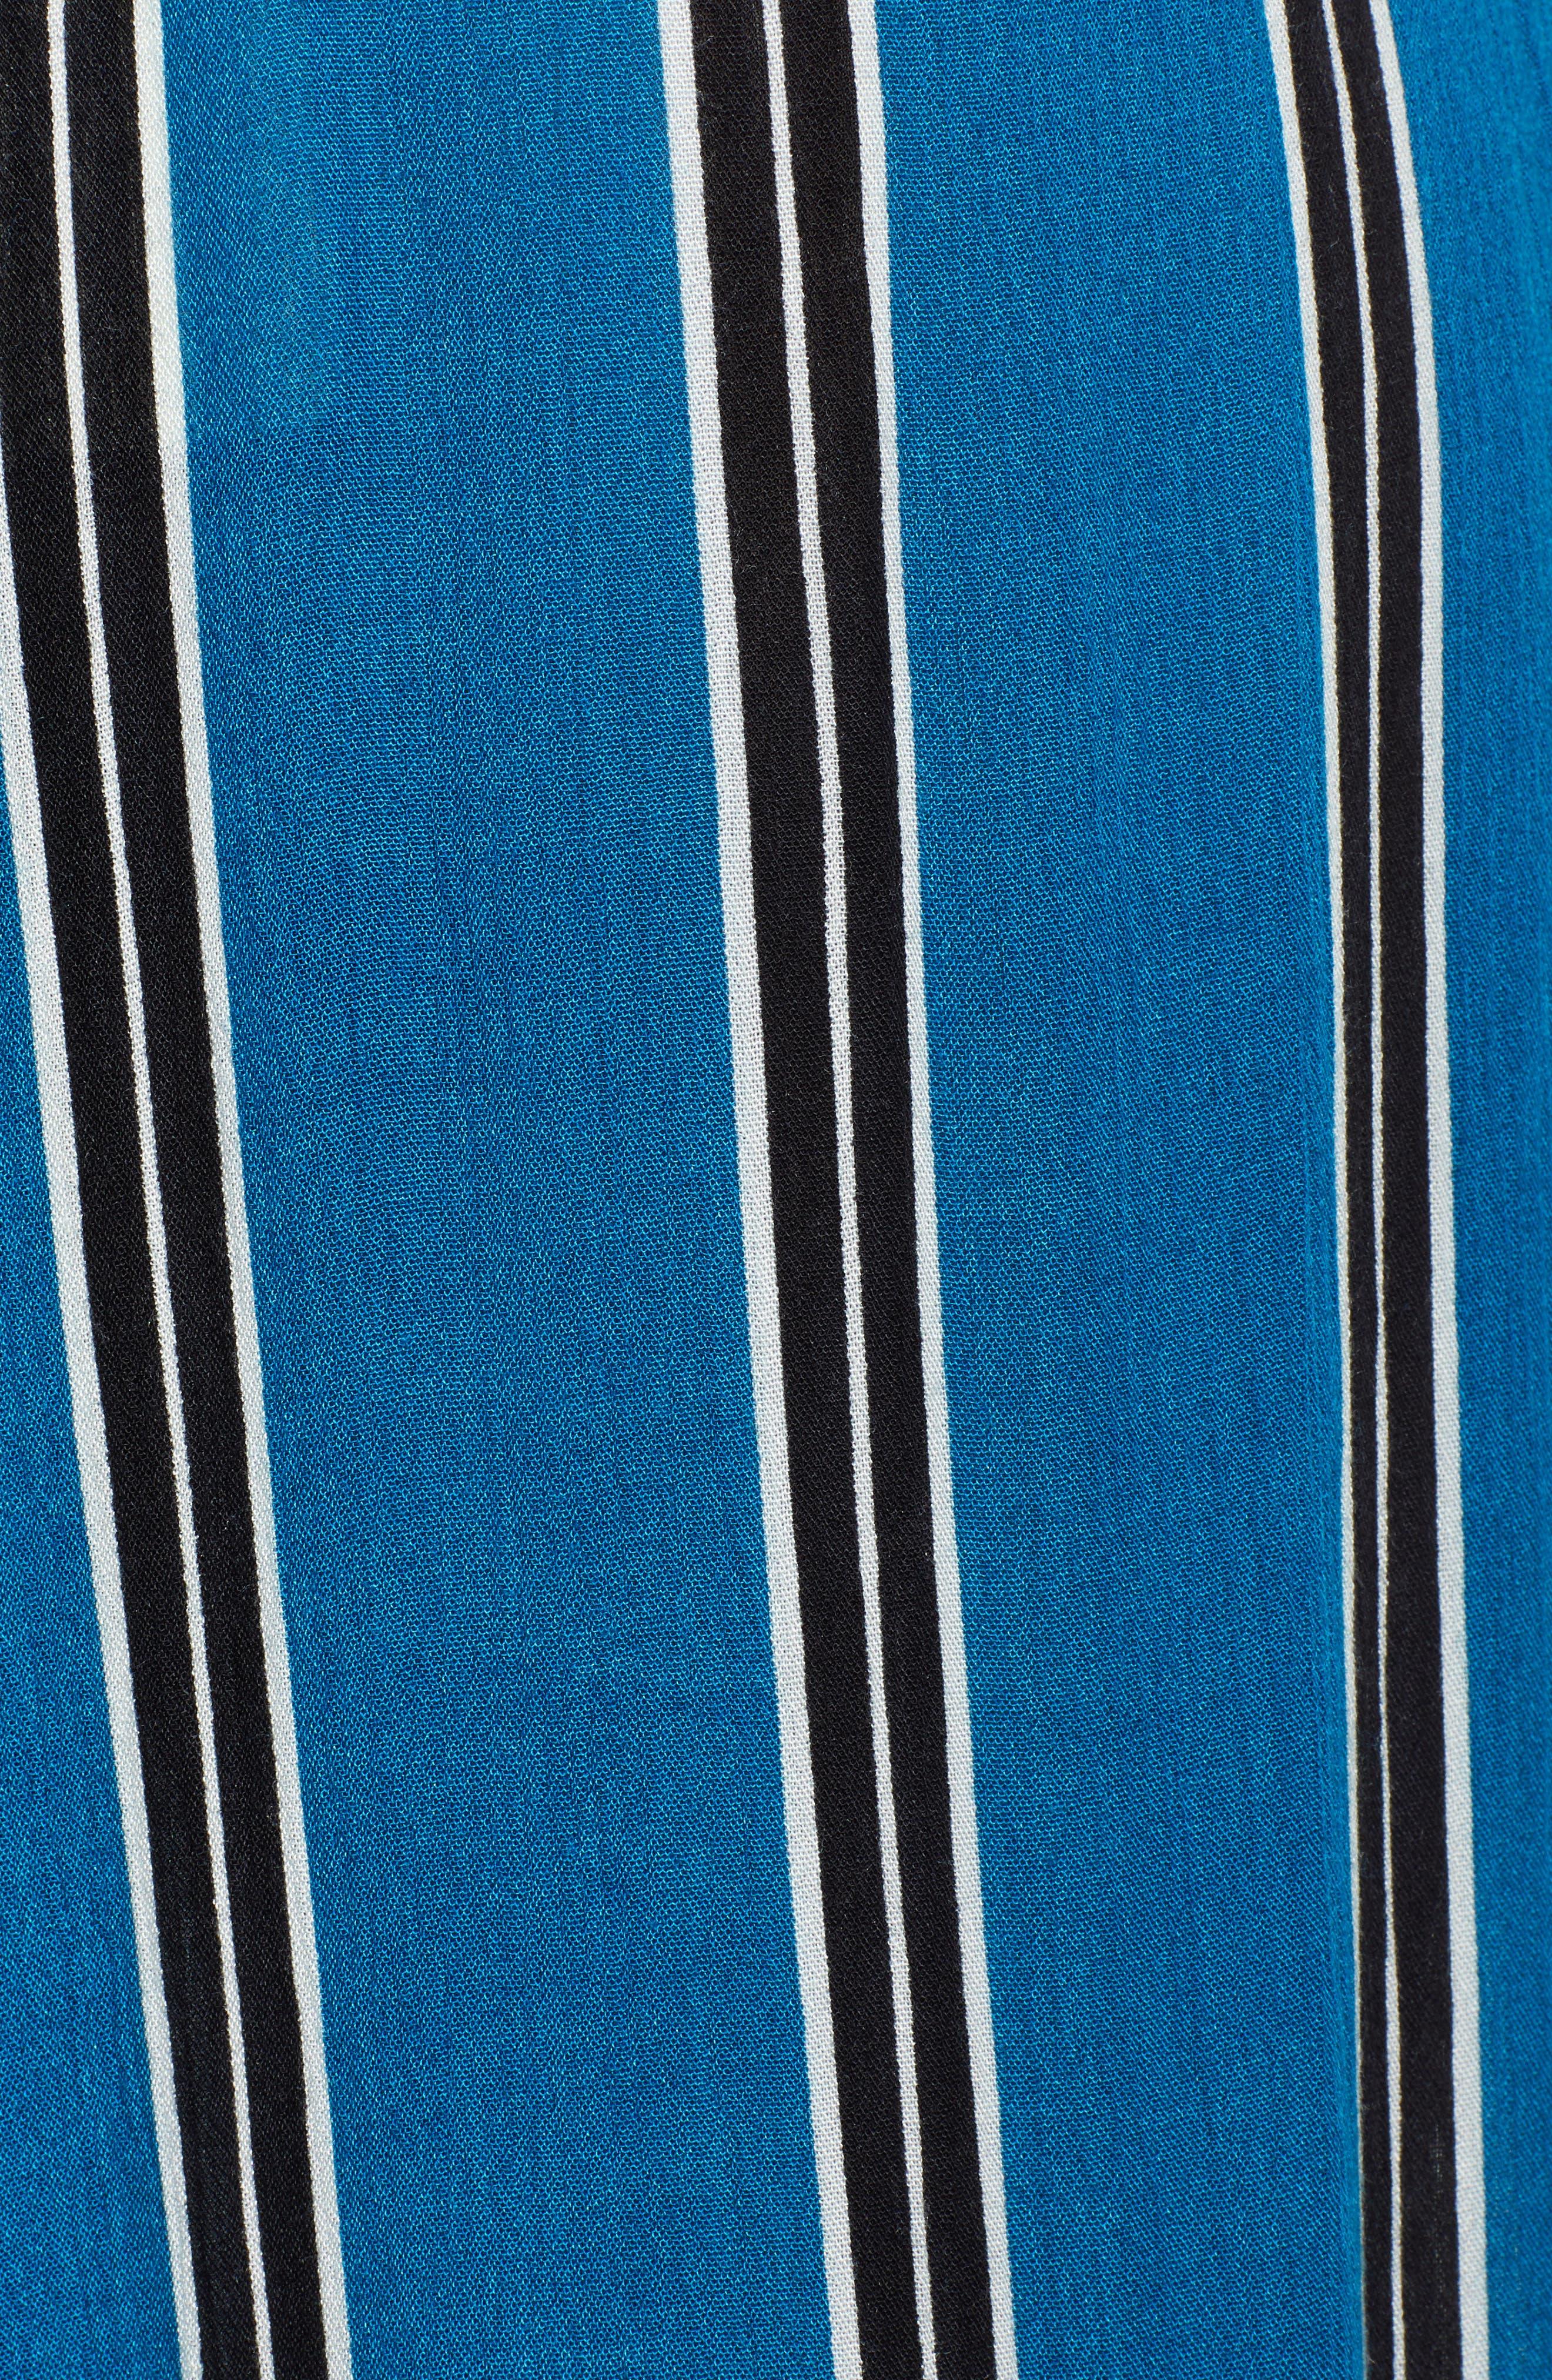 Stripe Wide Leg Pants,                             Alternate thumbnail 7, color,                             Blue/ Black